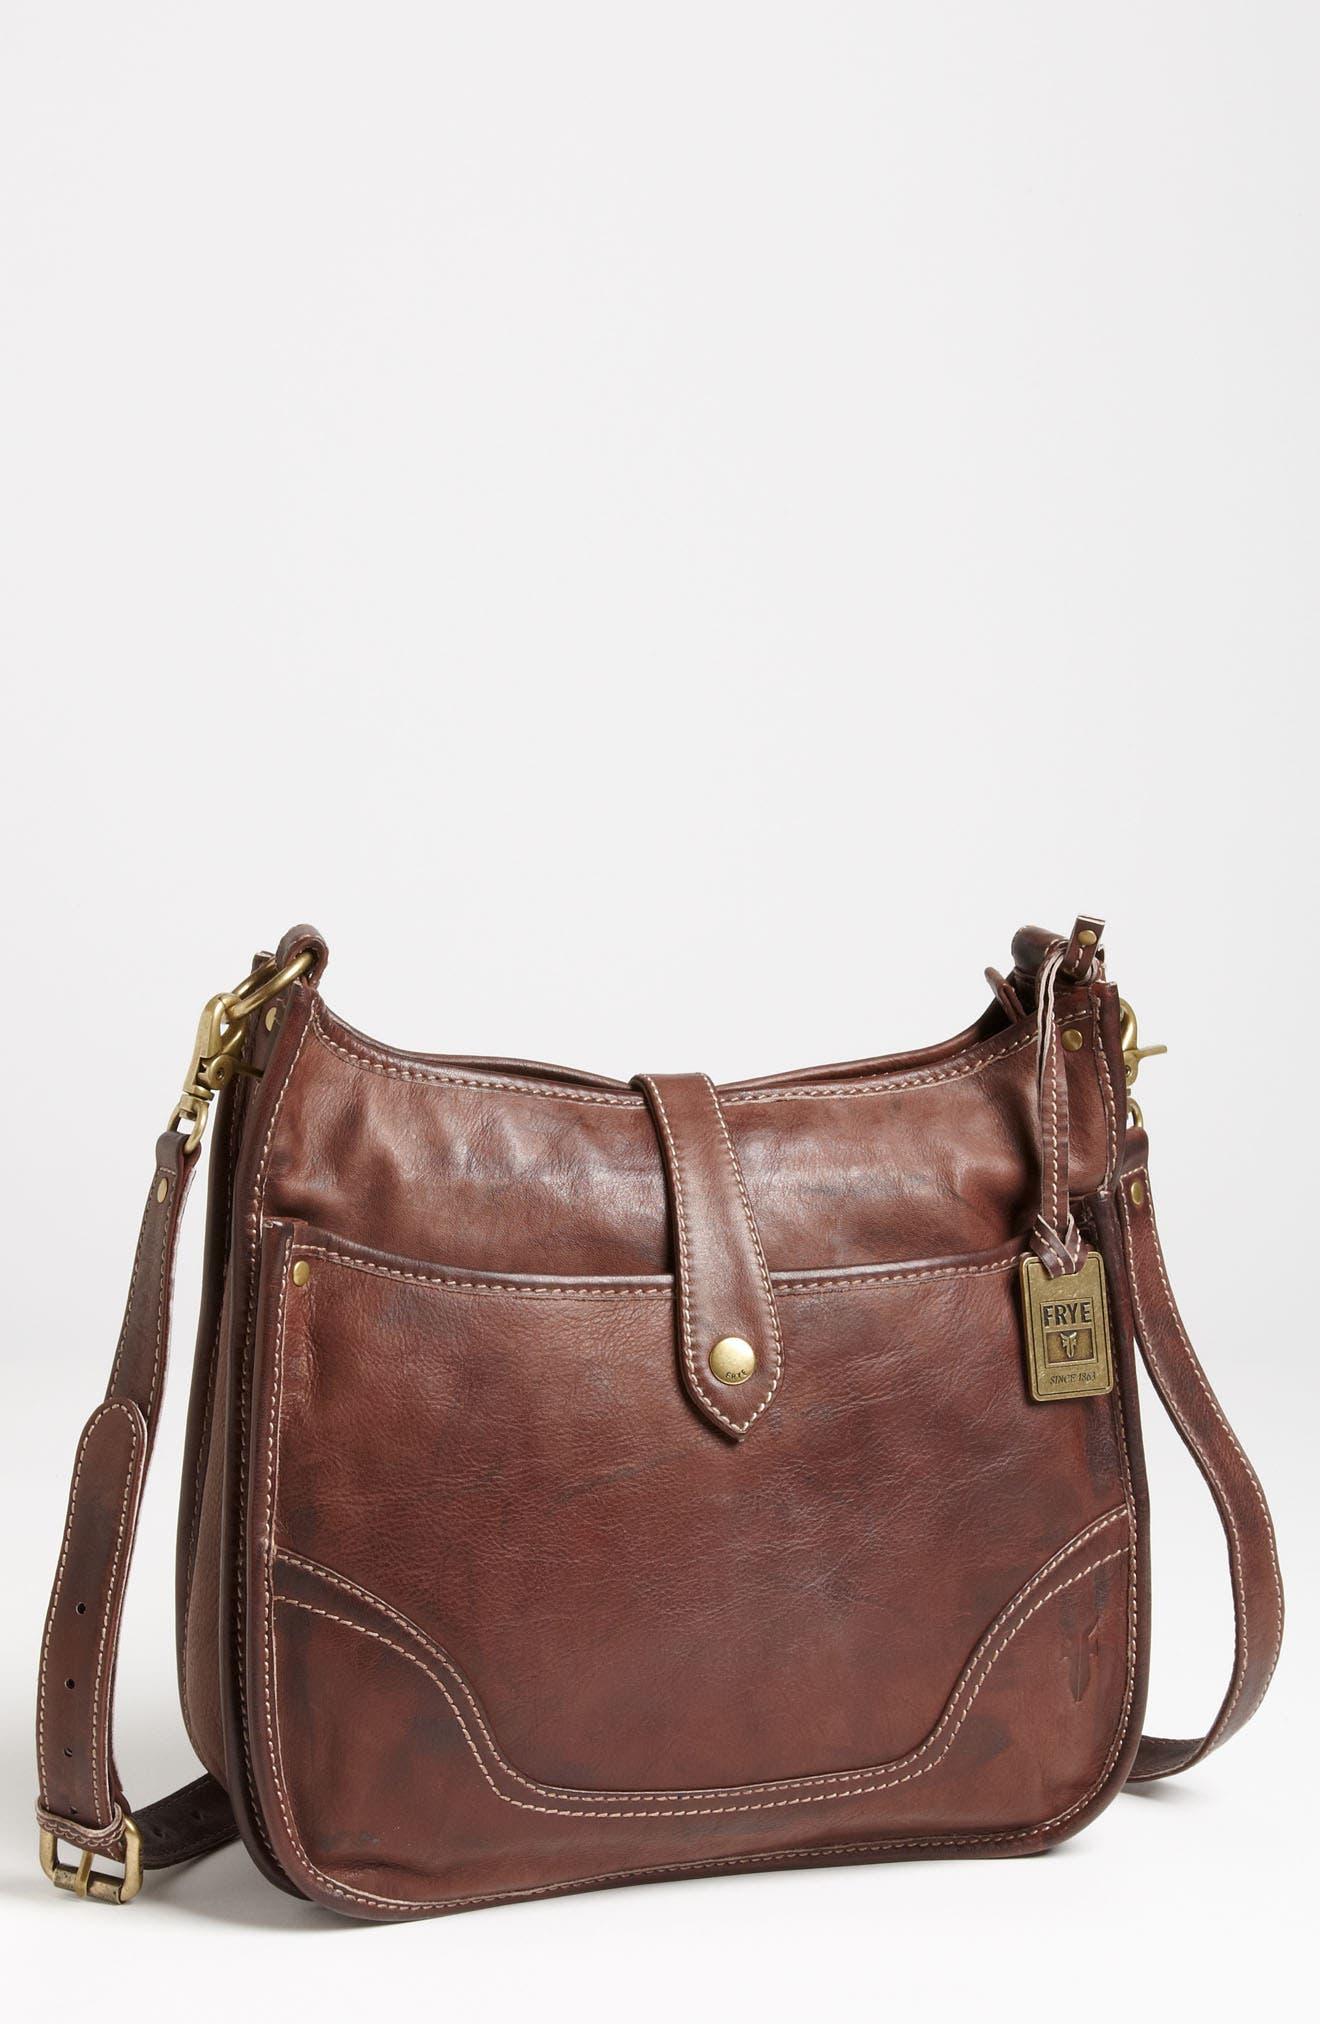 Alternate Image 1 Selected - Frye 'Campus' Leather Crossbody Bag